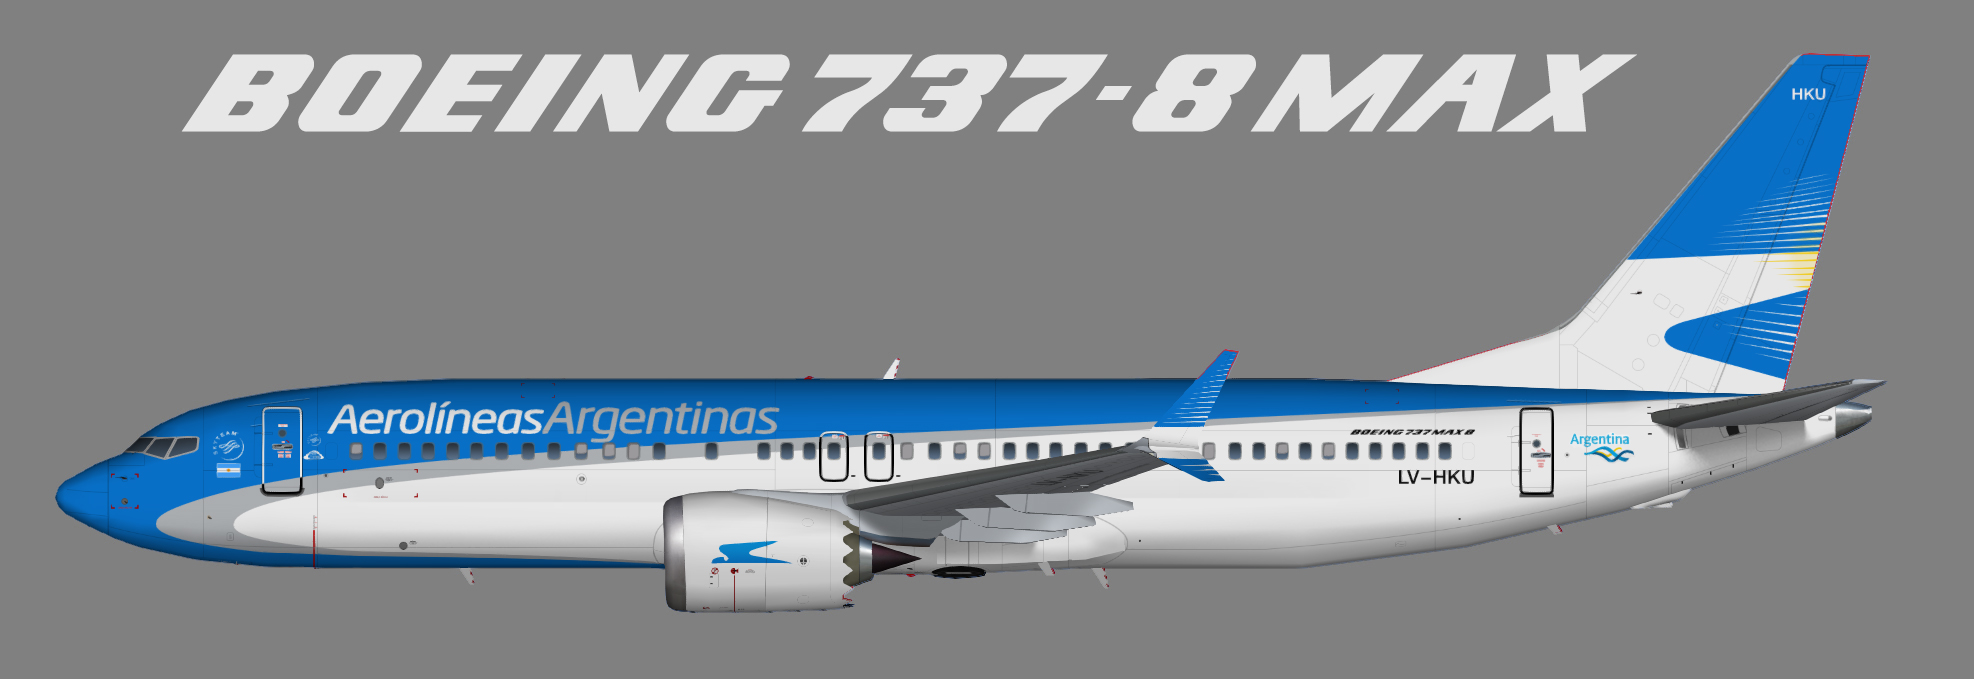 Aerolineas Argentinas Boeing 737 MAX 8